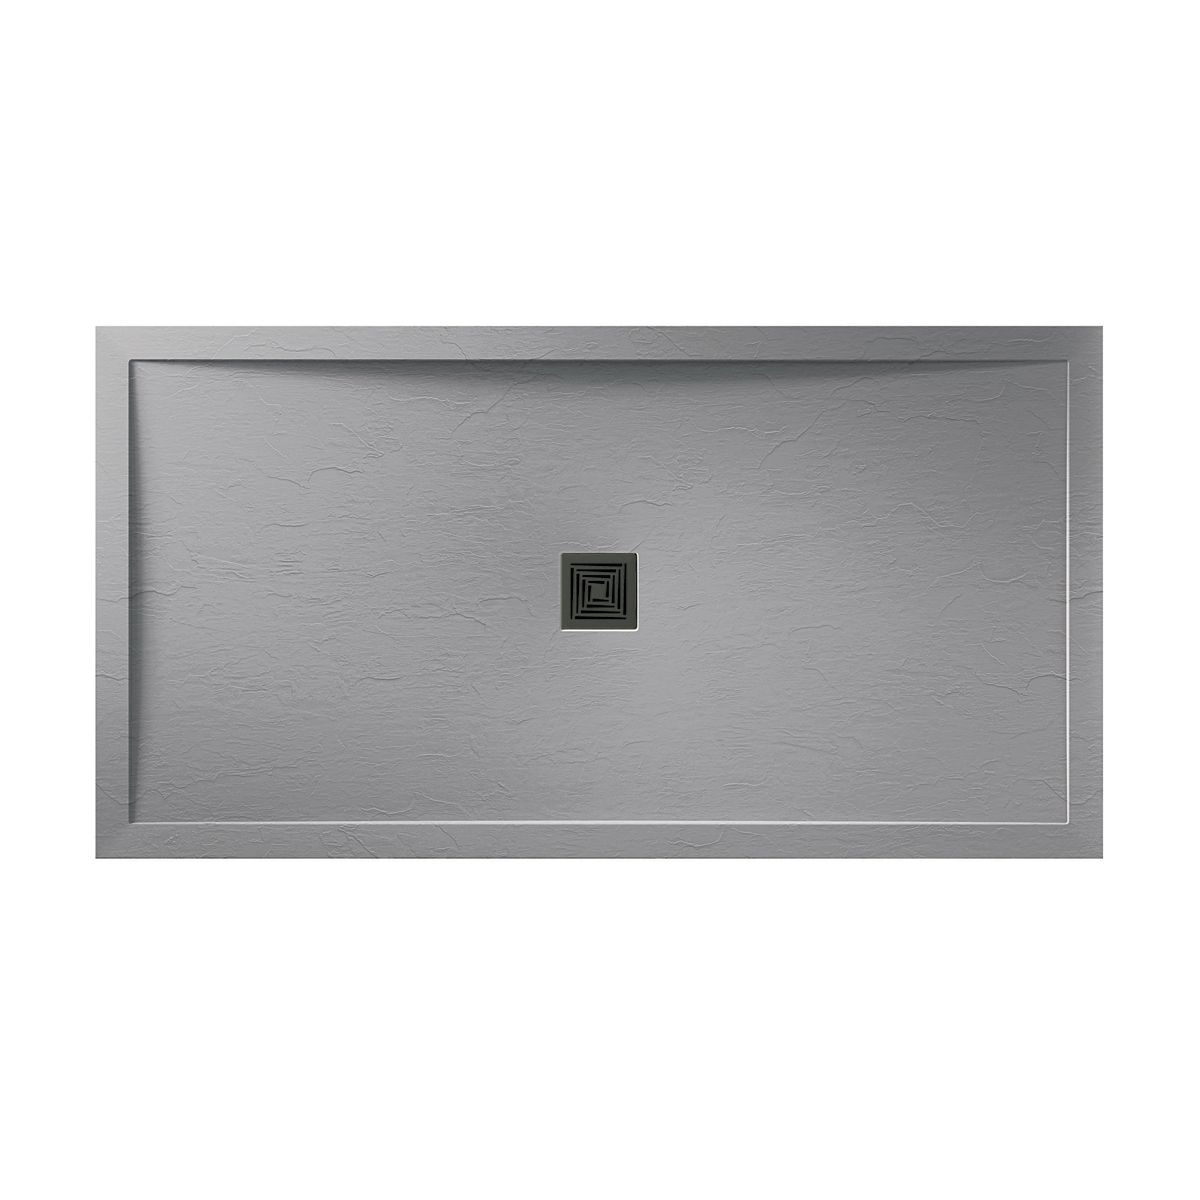 Aquadart Grey Slate Shower Tray 1400 x 800